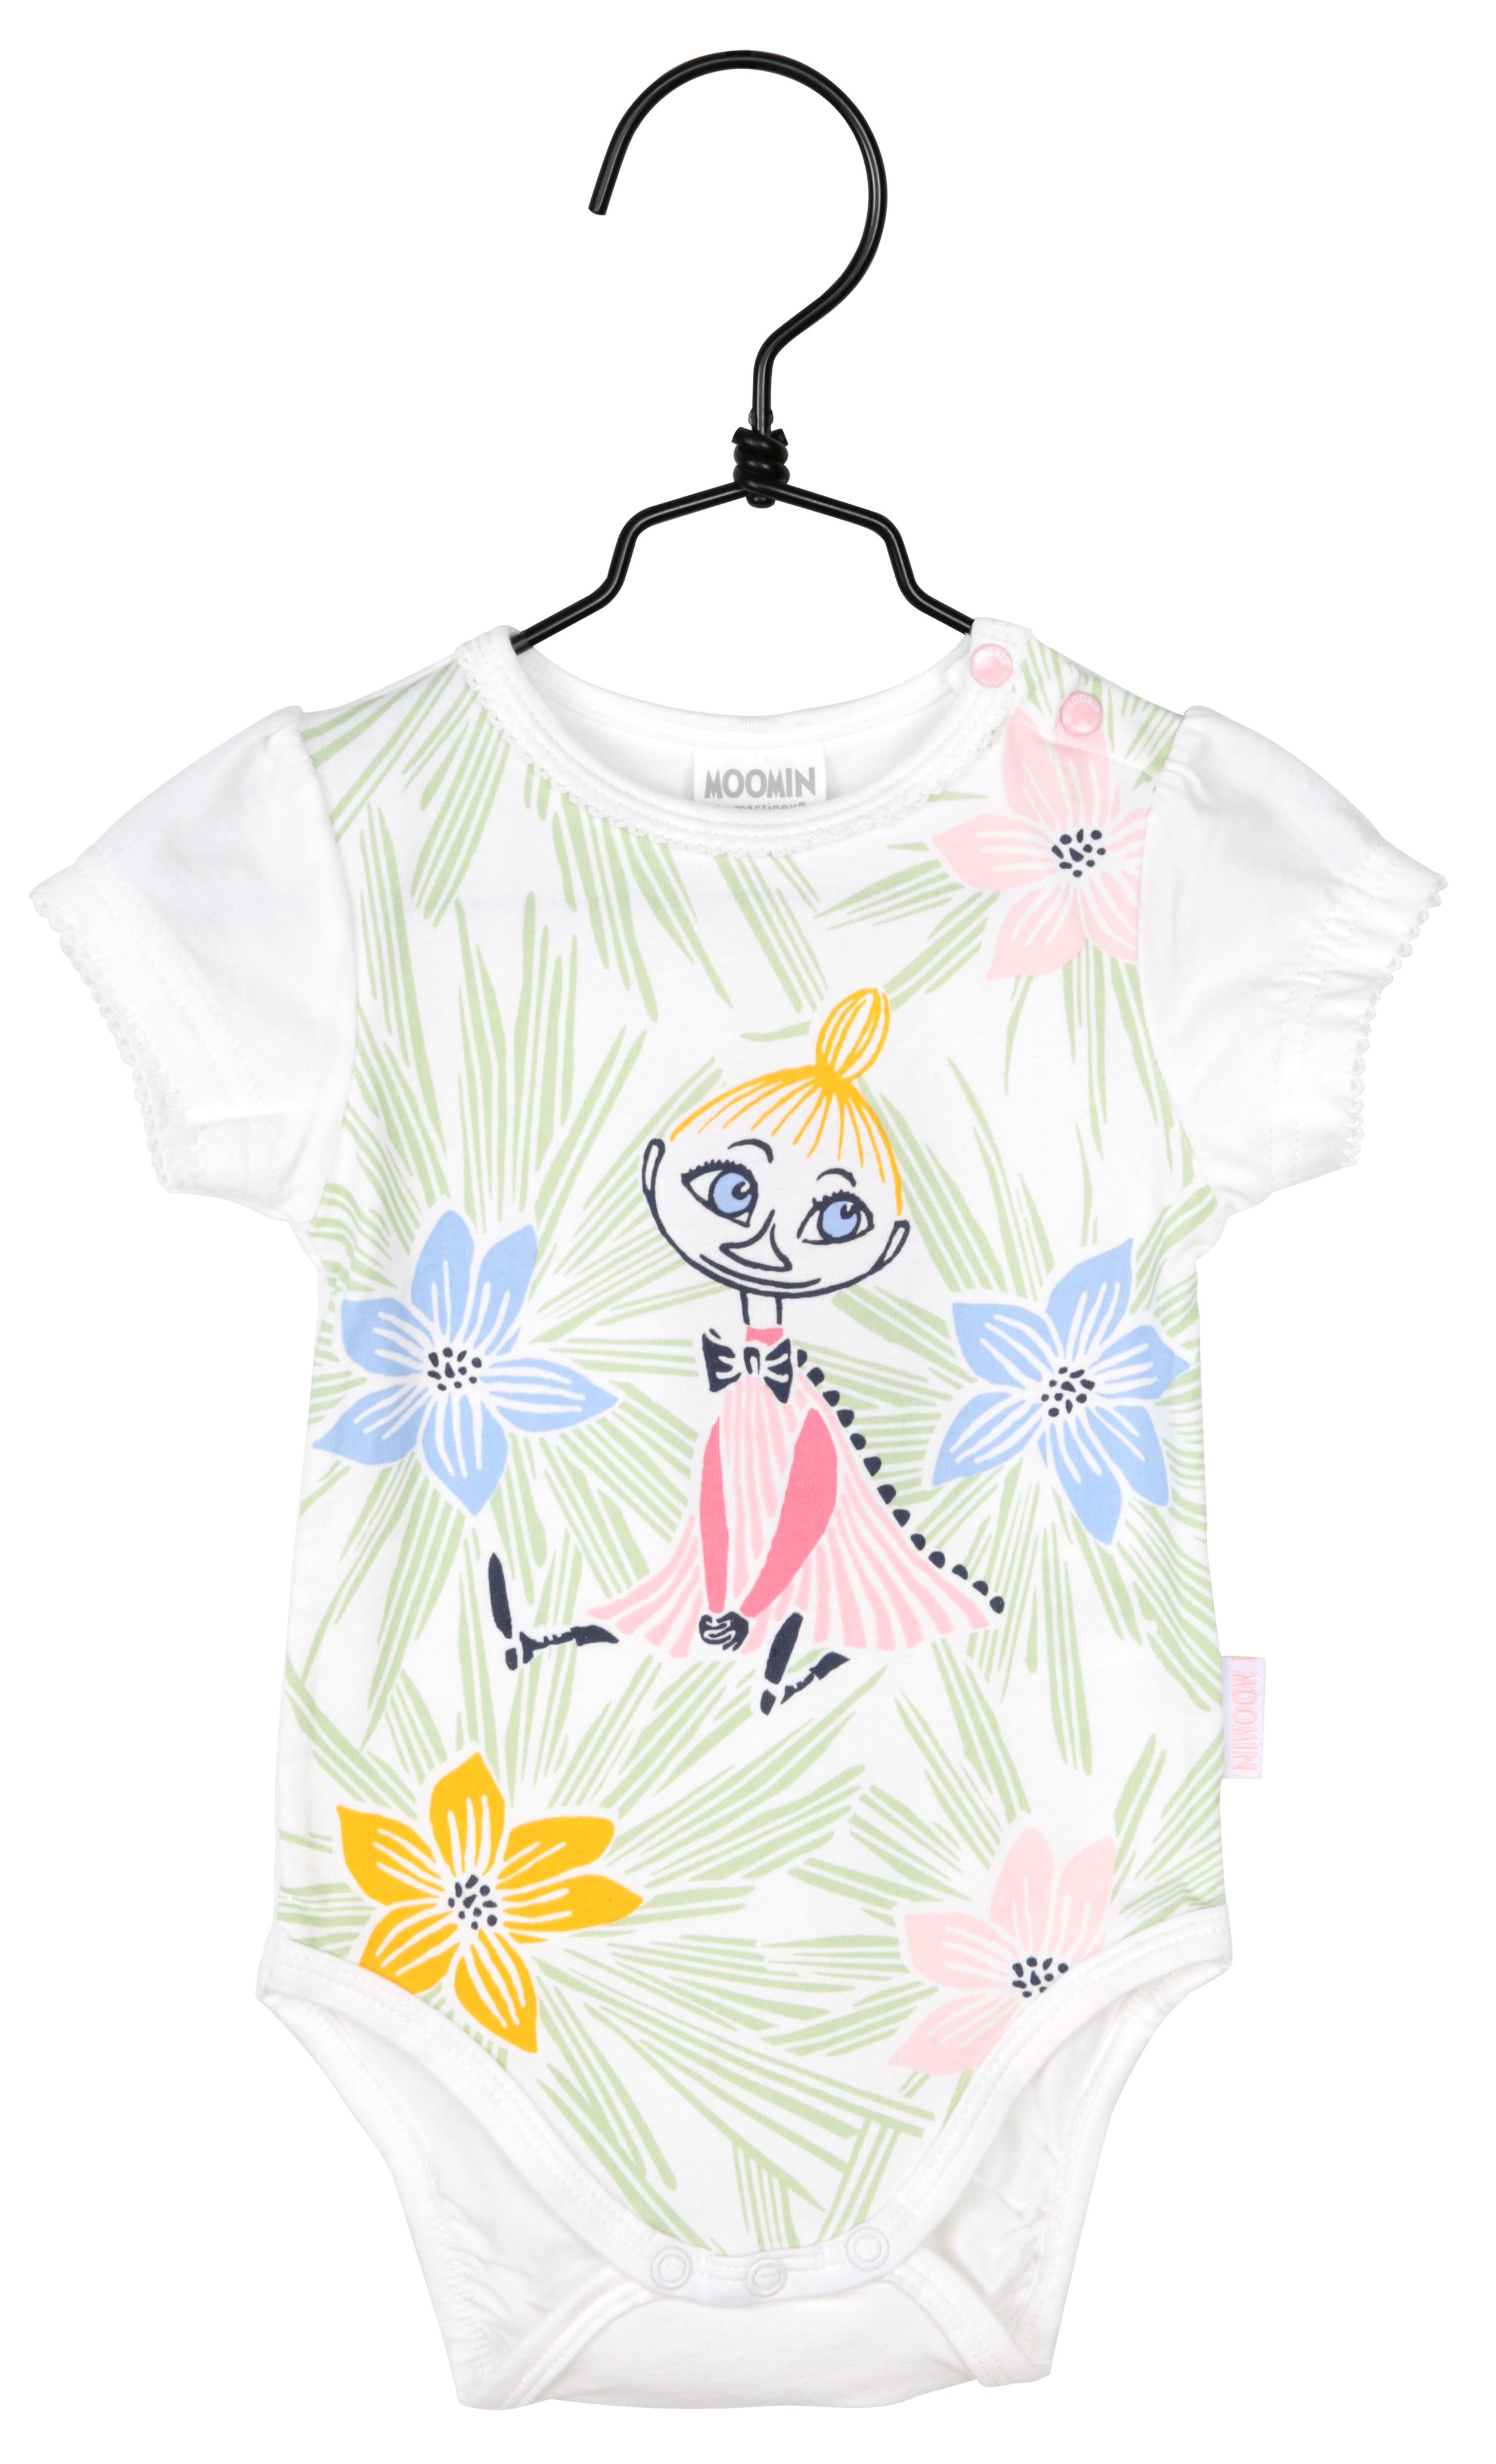 Martinex Moomin Hibiscus Bodysuit